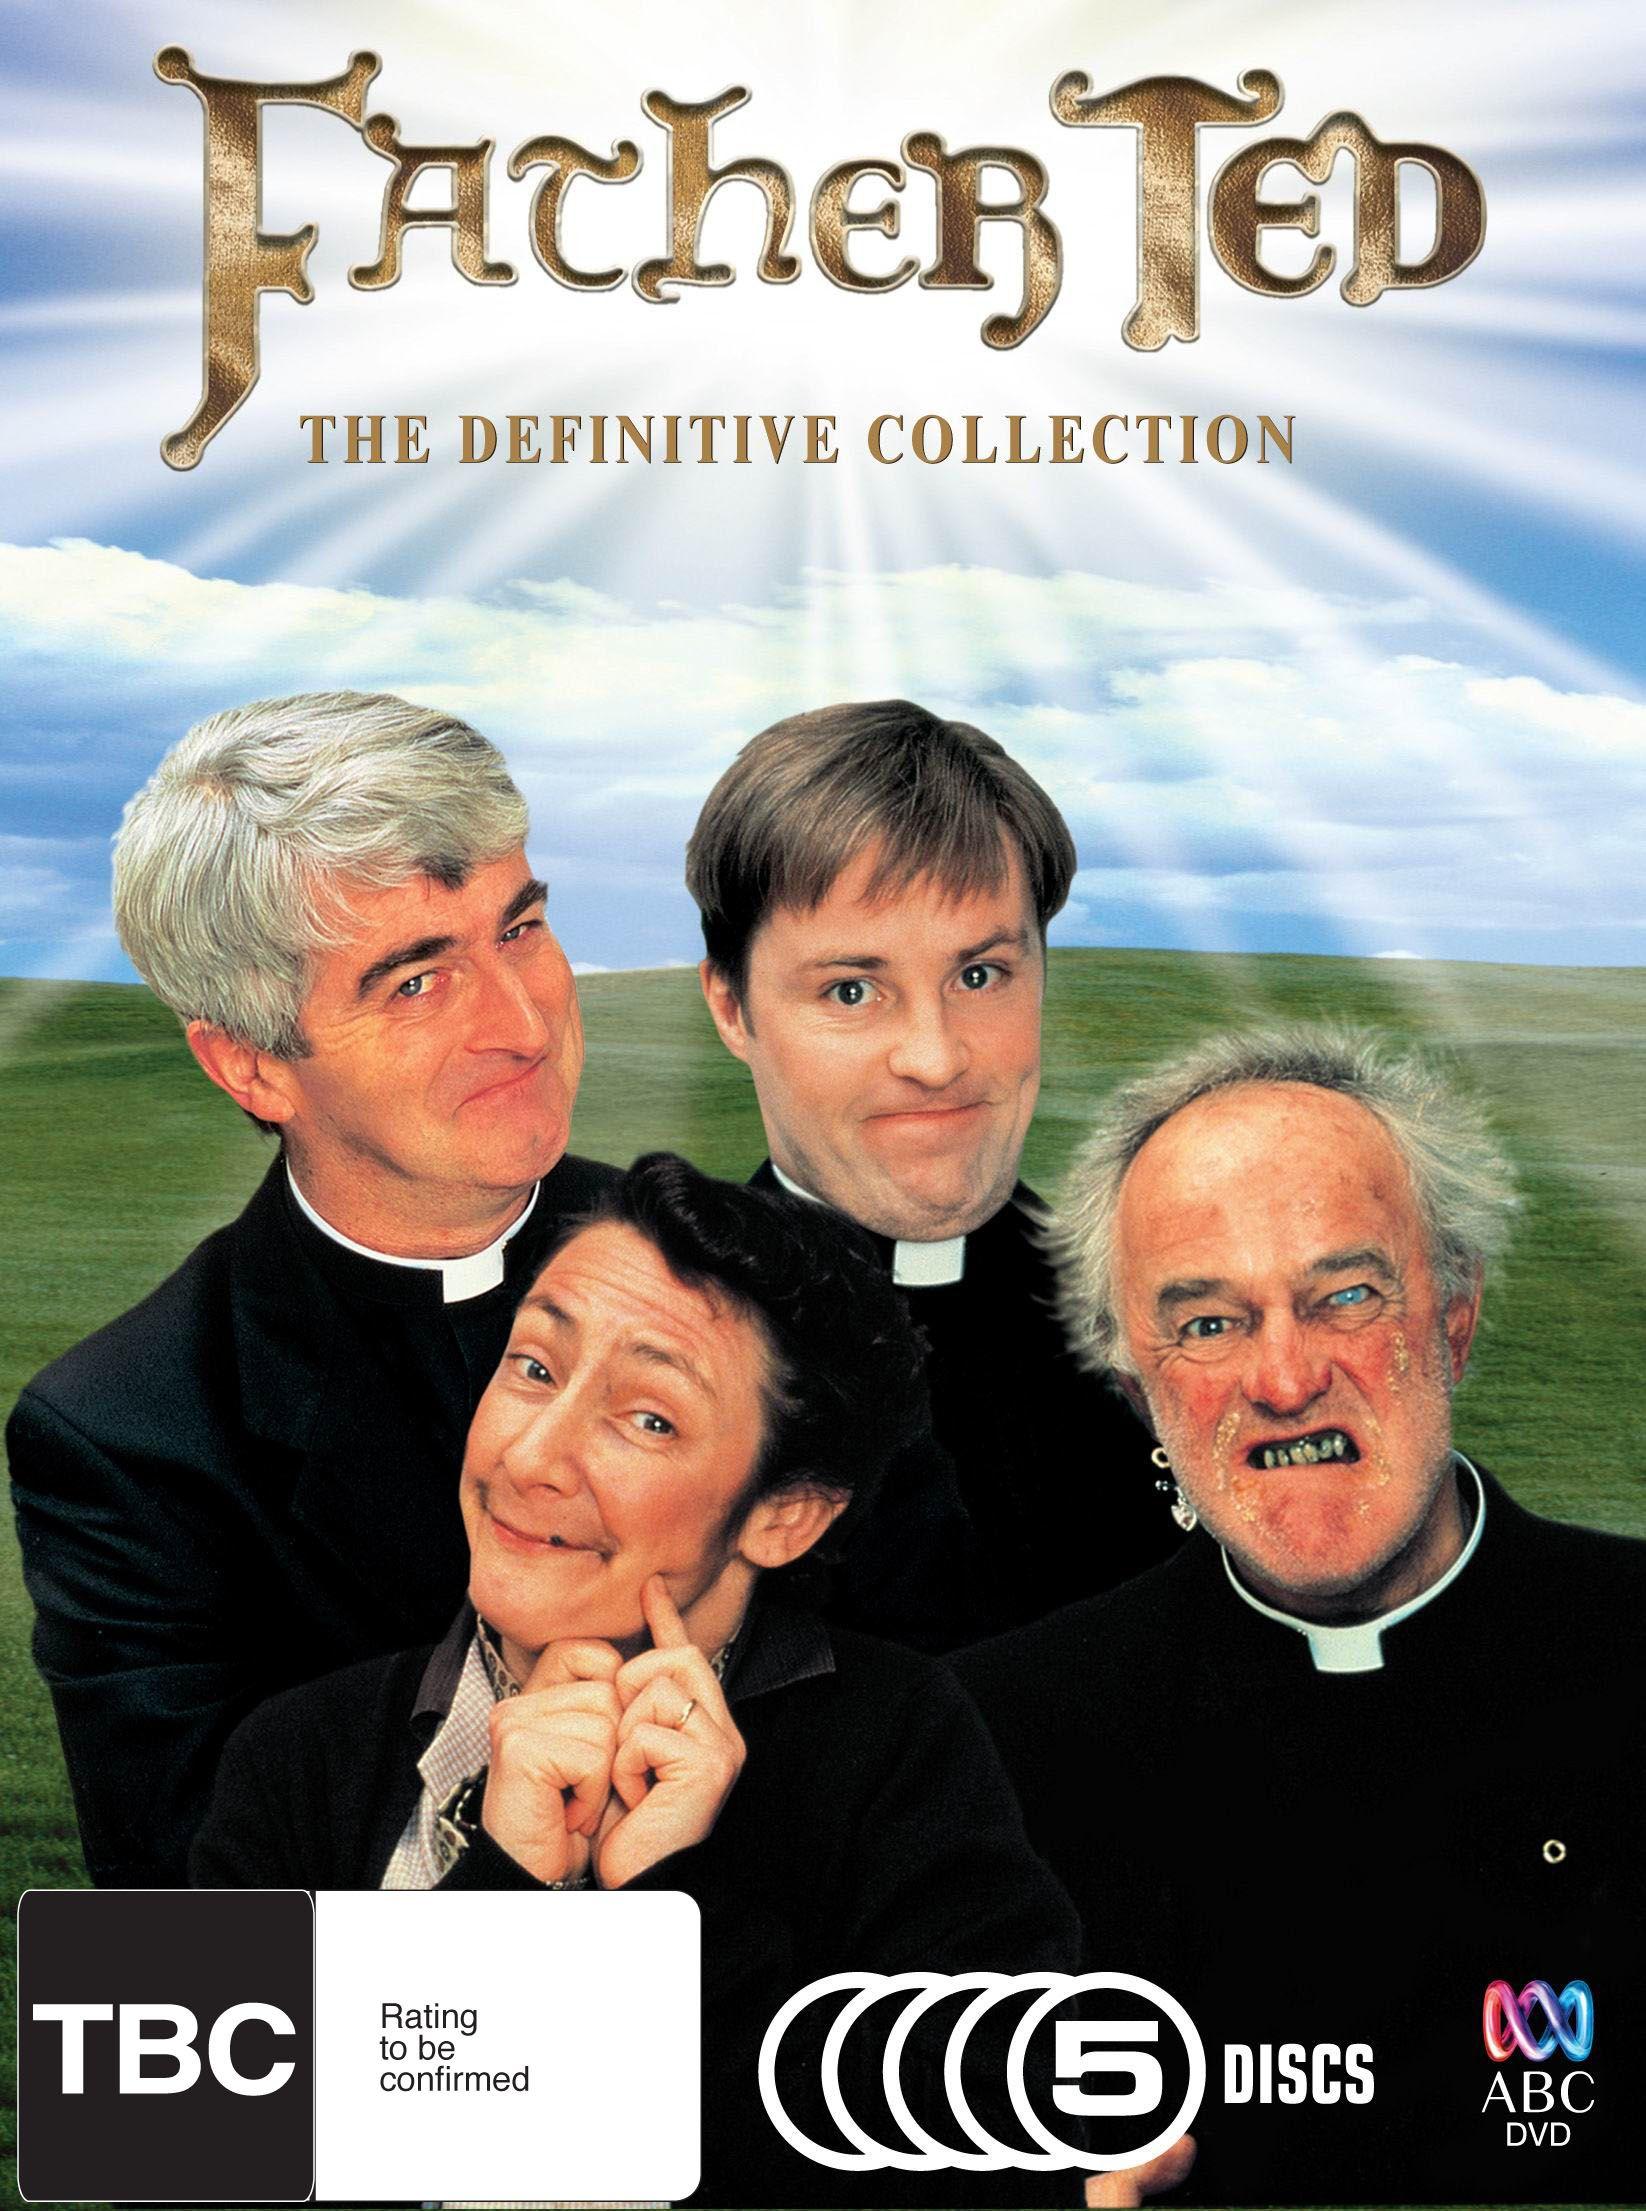 Father Ted - BBC TV series - stars Dermot Morgan, Ardal O